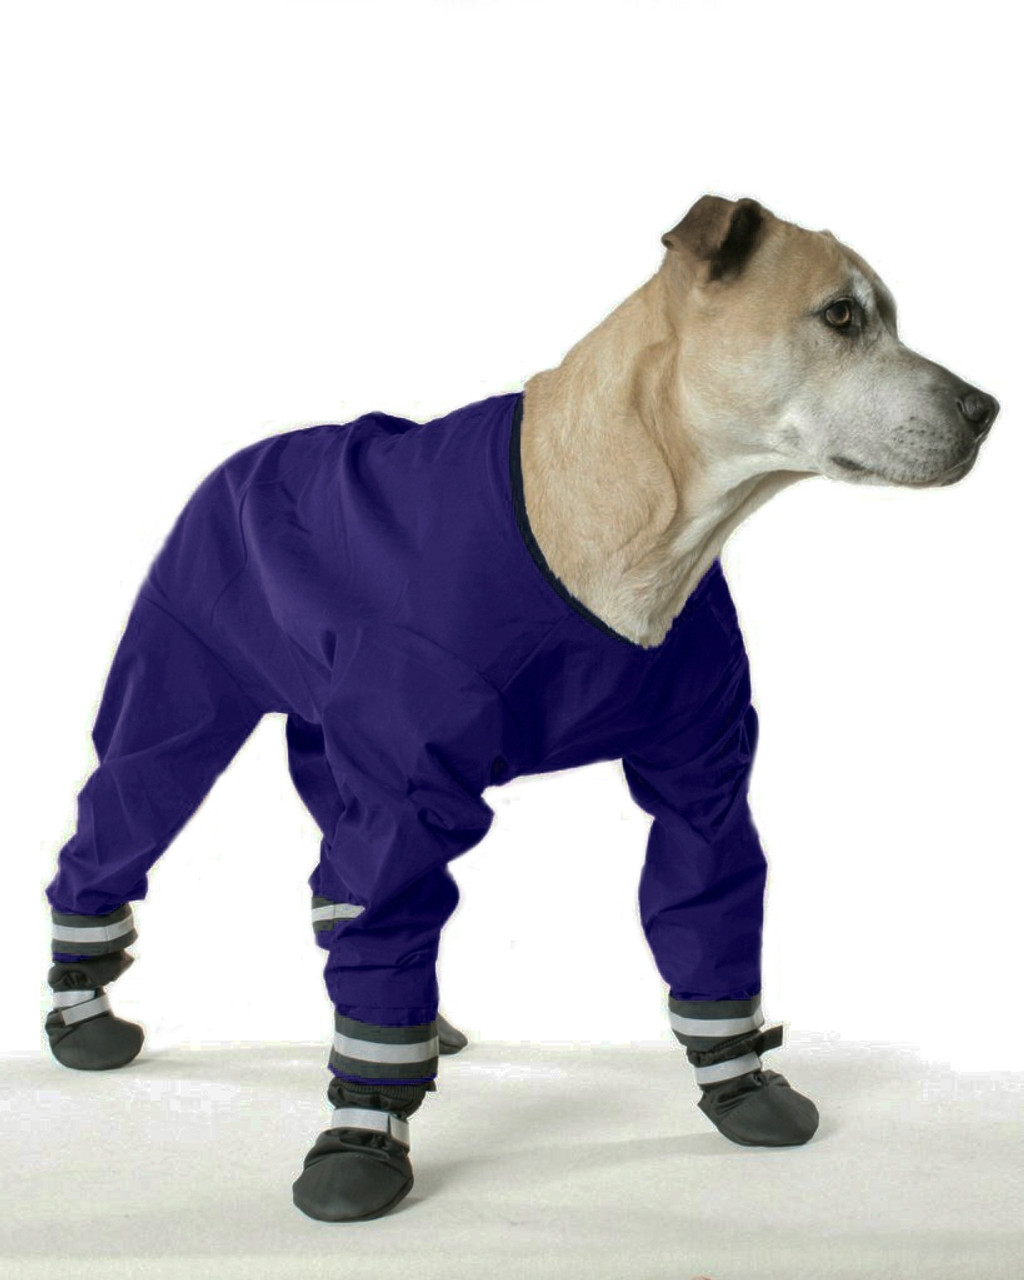 Large NCAA Long Beach State 49ers Polar Fleece Hooded Dog Jacket